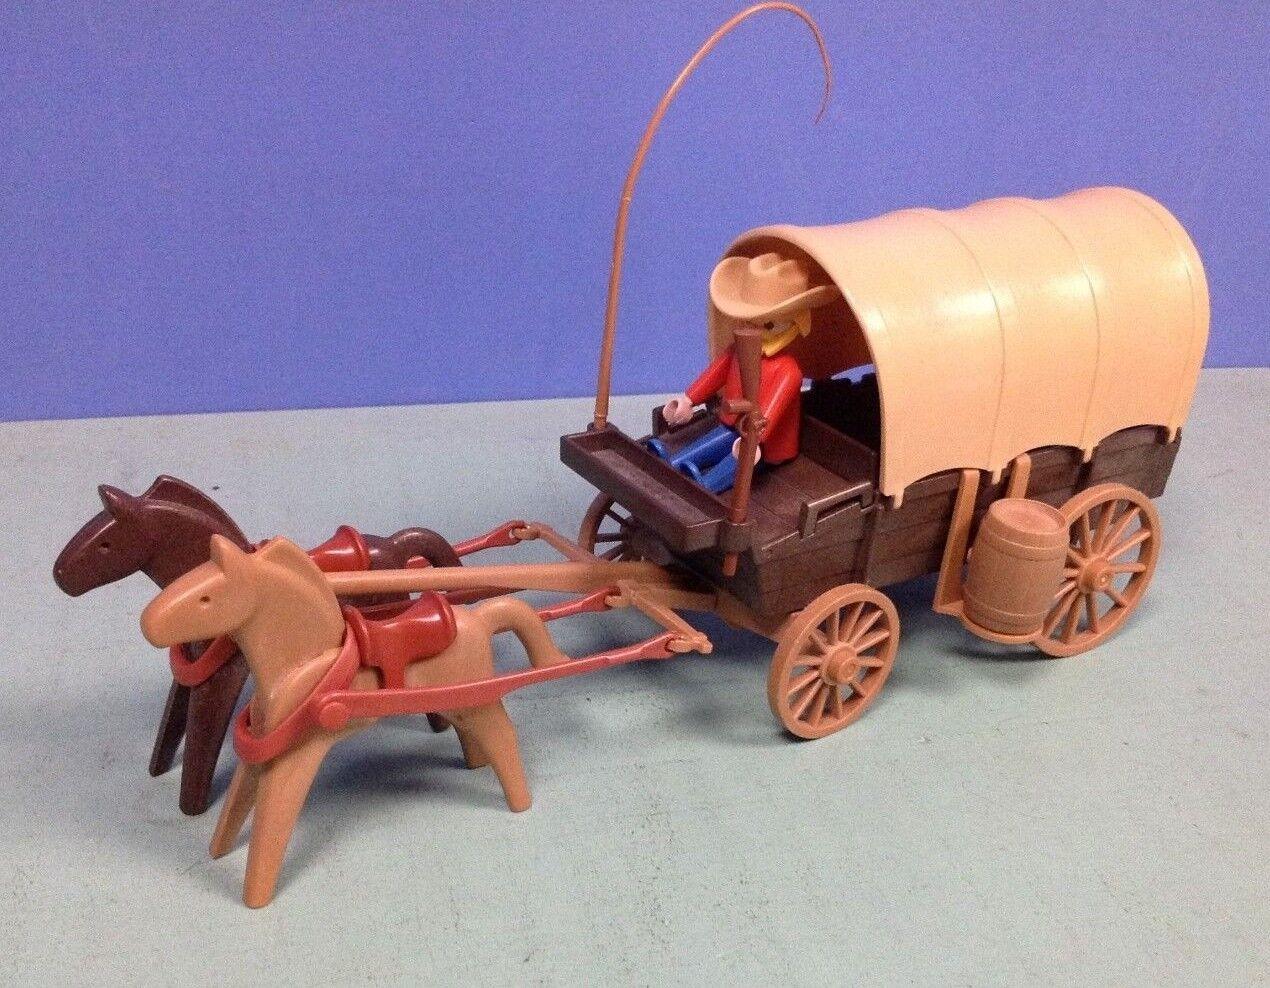 (O3278.2) playmobil chariot western V2 ref 3278 3278 3278 vintage klicky 1978 3a087c